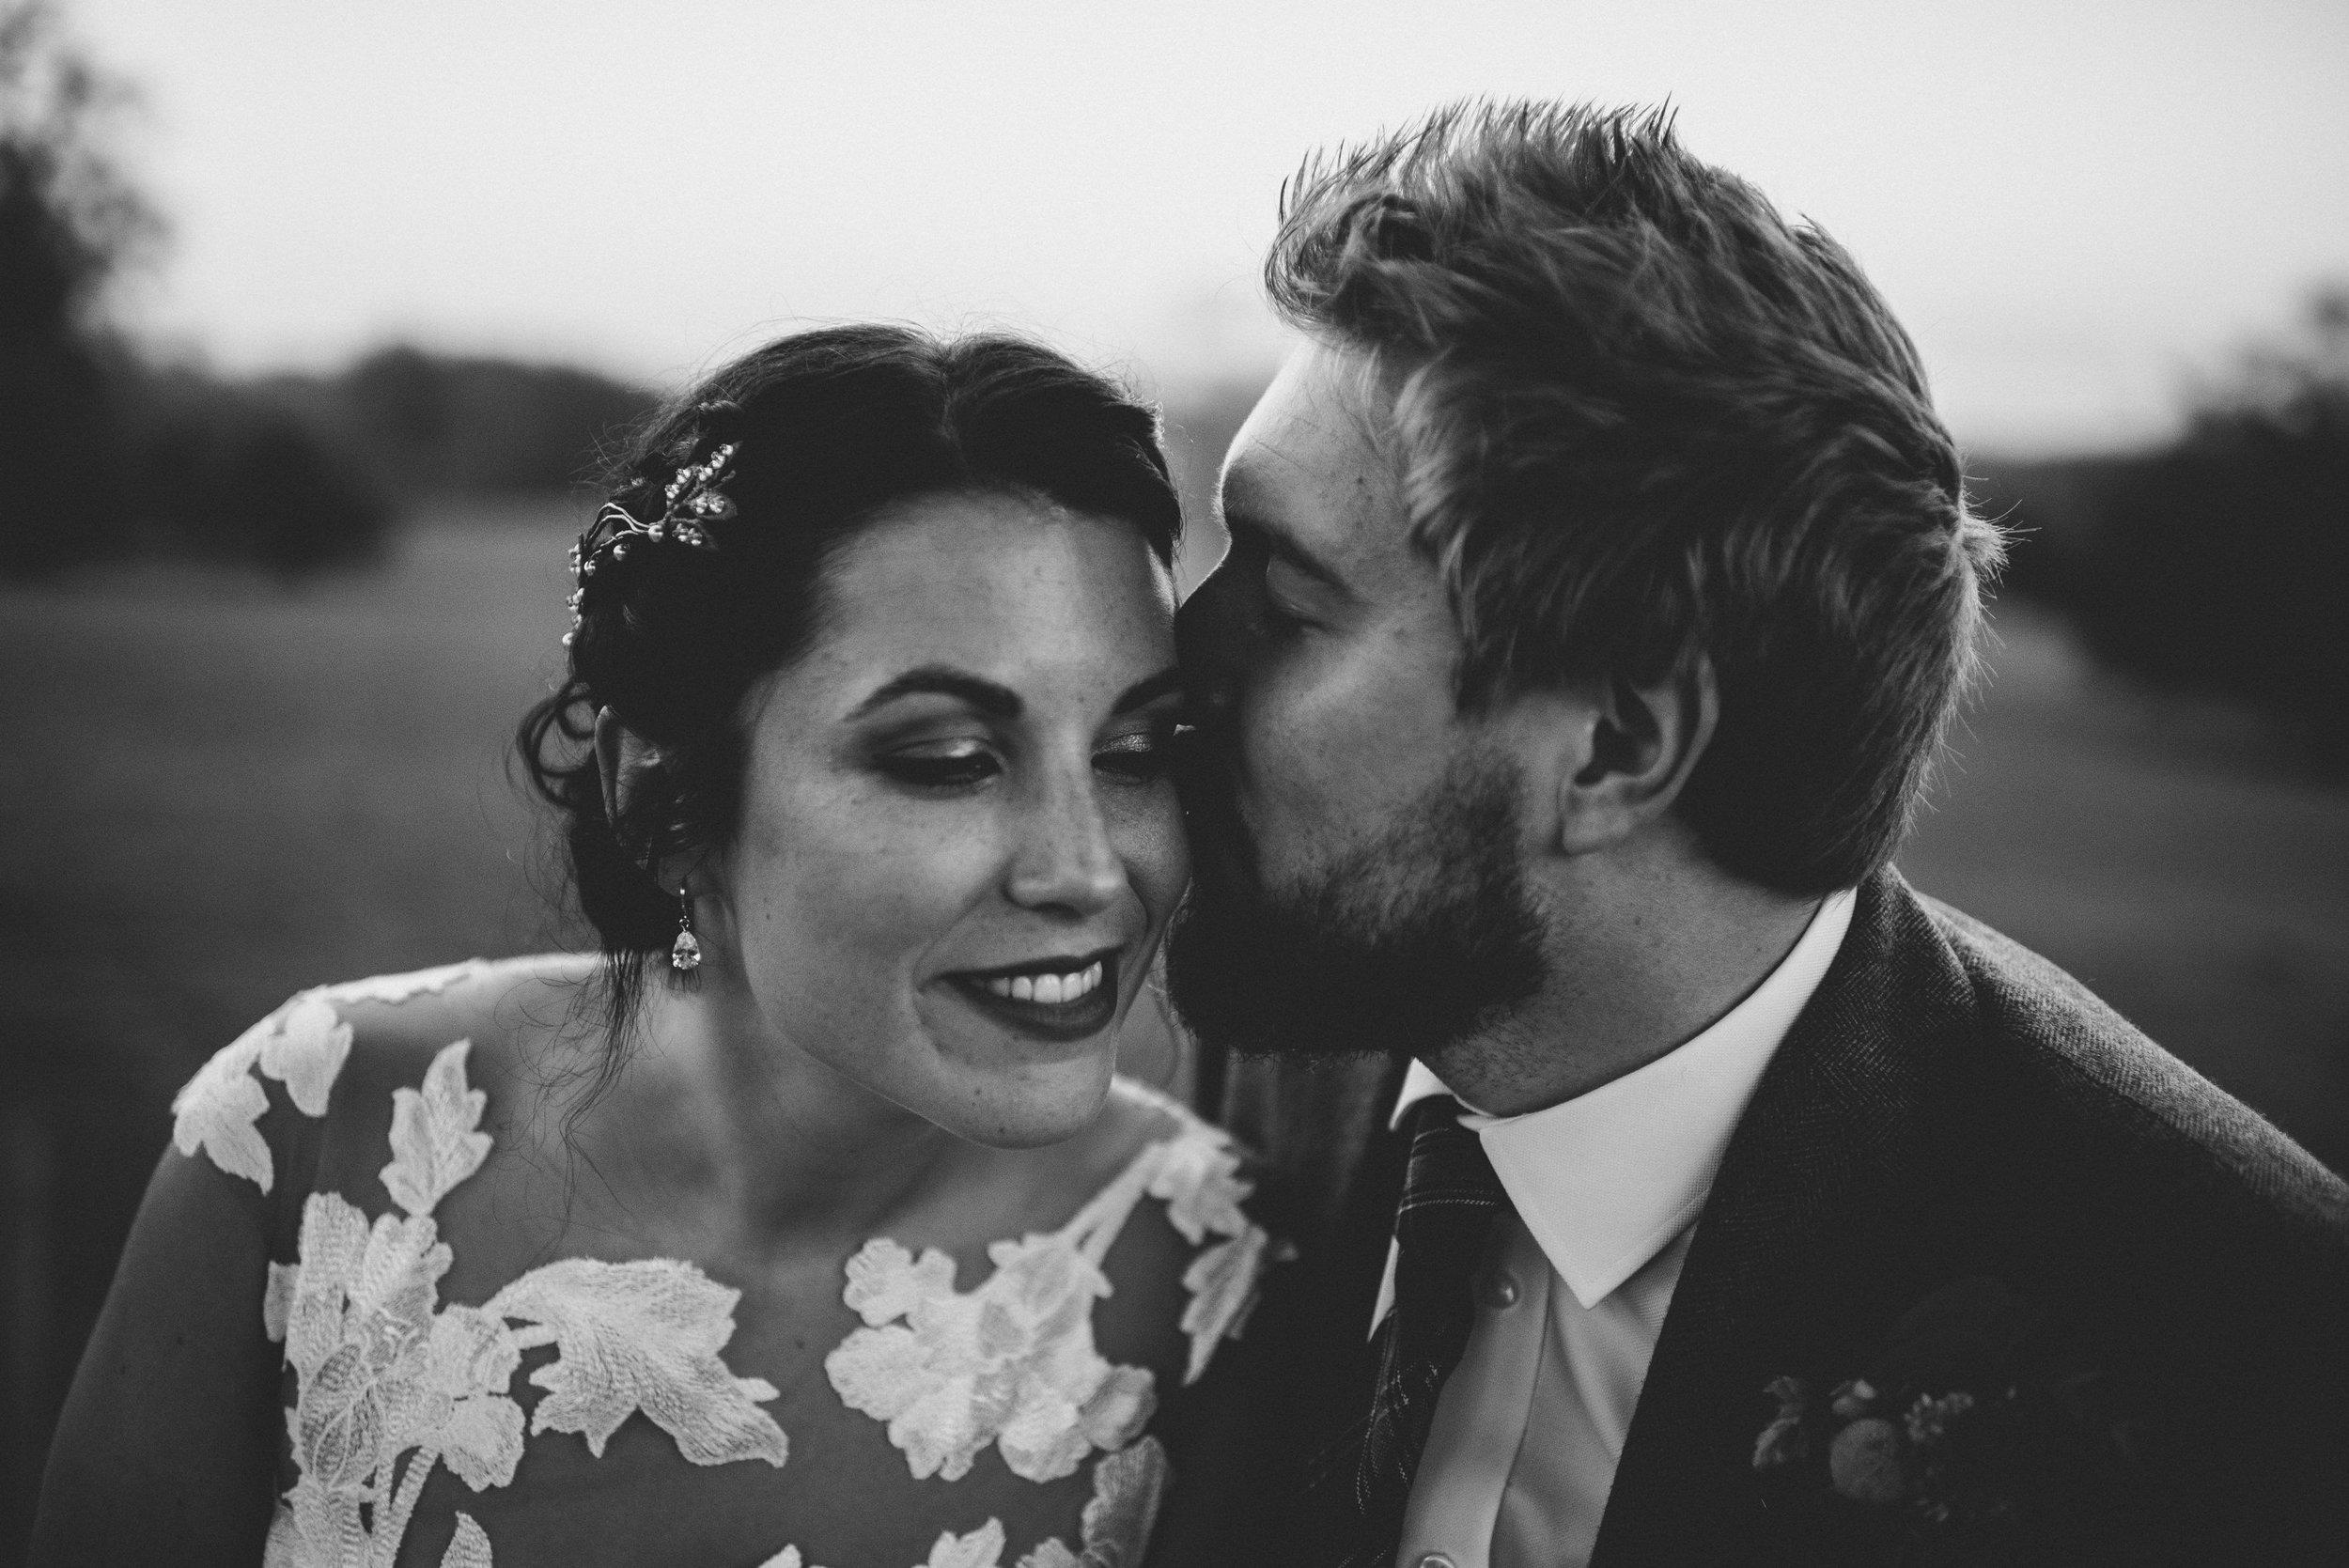 0097-LISA-DEVINE-PHOTOGRAPHY-ALTERNATIVE-WEDDING-PHOTOGRAPHY-SCOTLAND-DESTINATION-WEDDINGS-GLASGOW-WEDDINGS-COOL-WEDDINGS-STYLISH-WEDDINGS.JPG